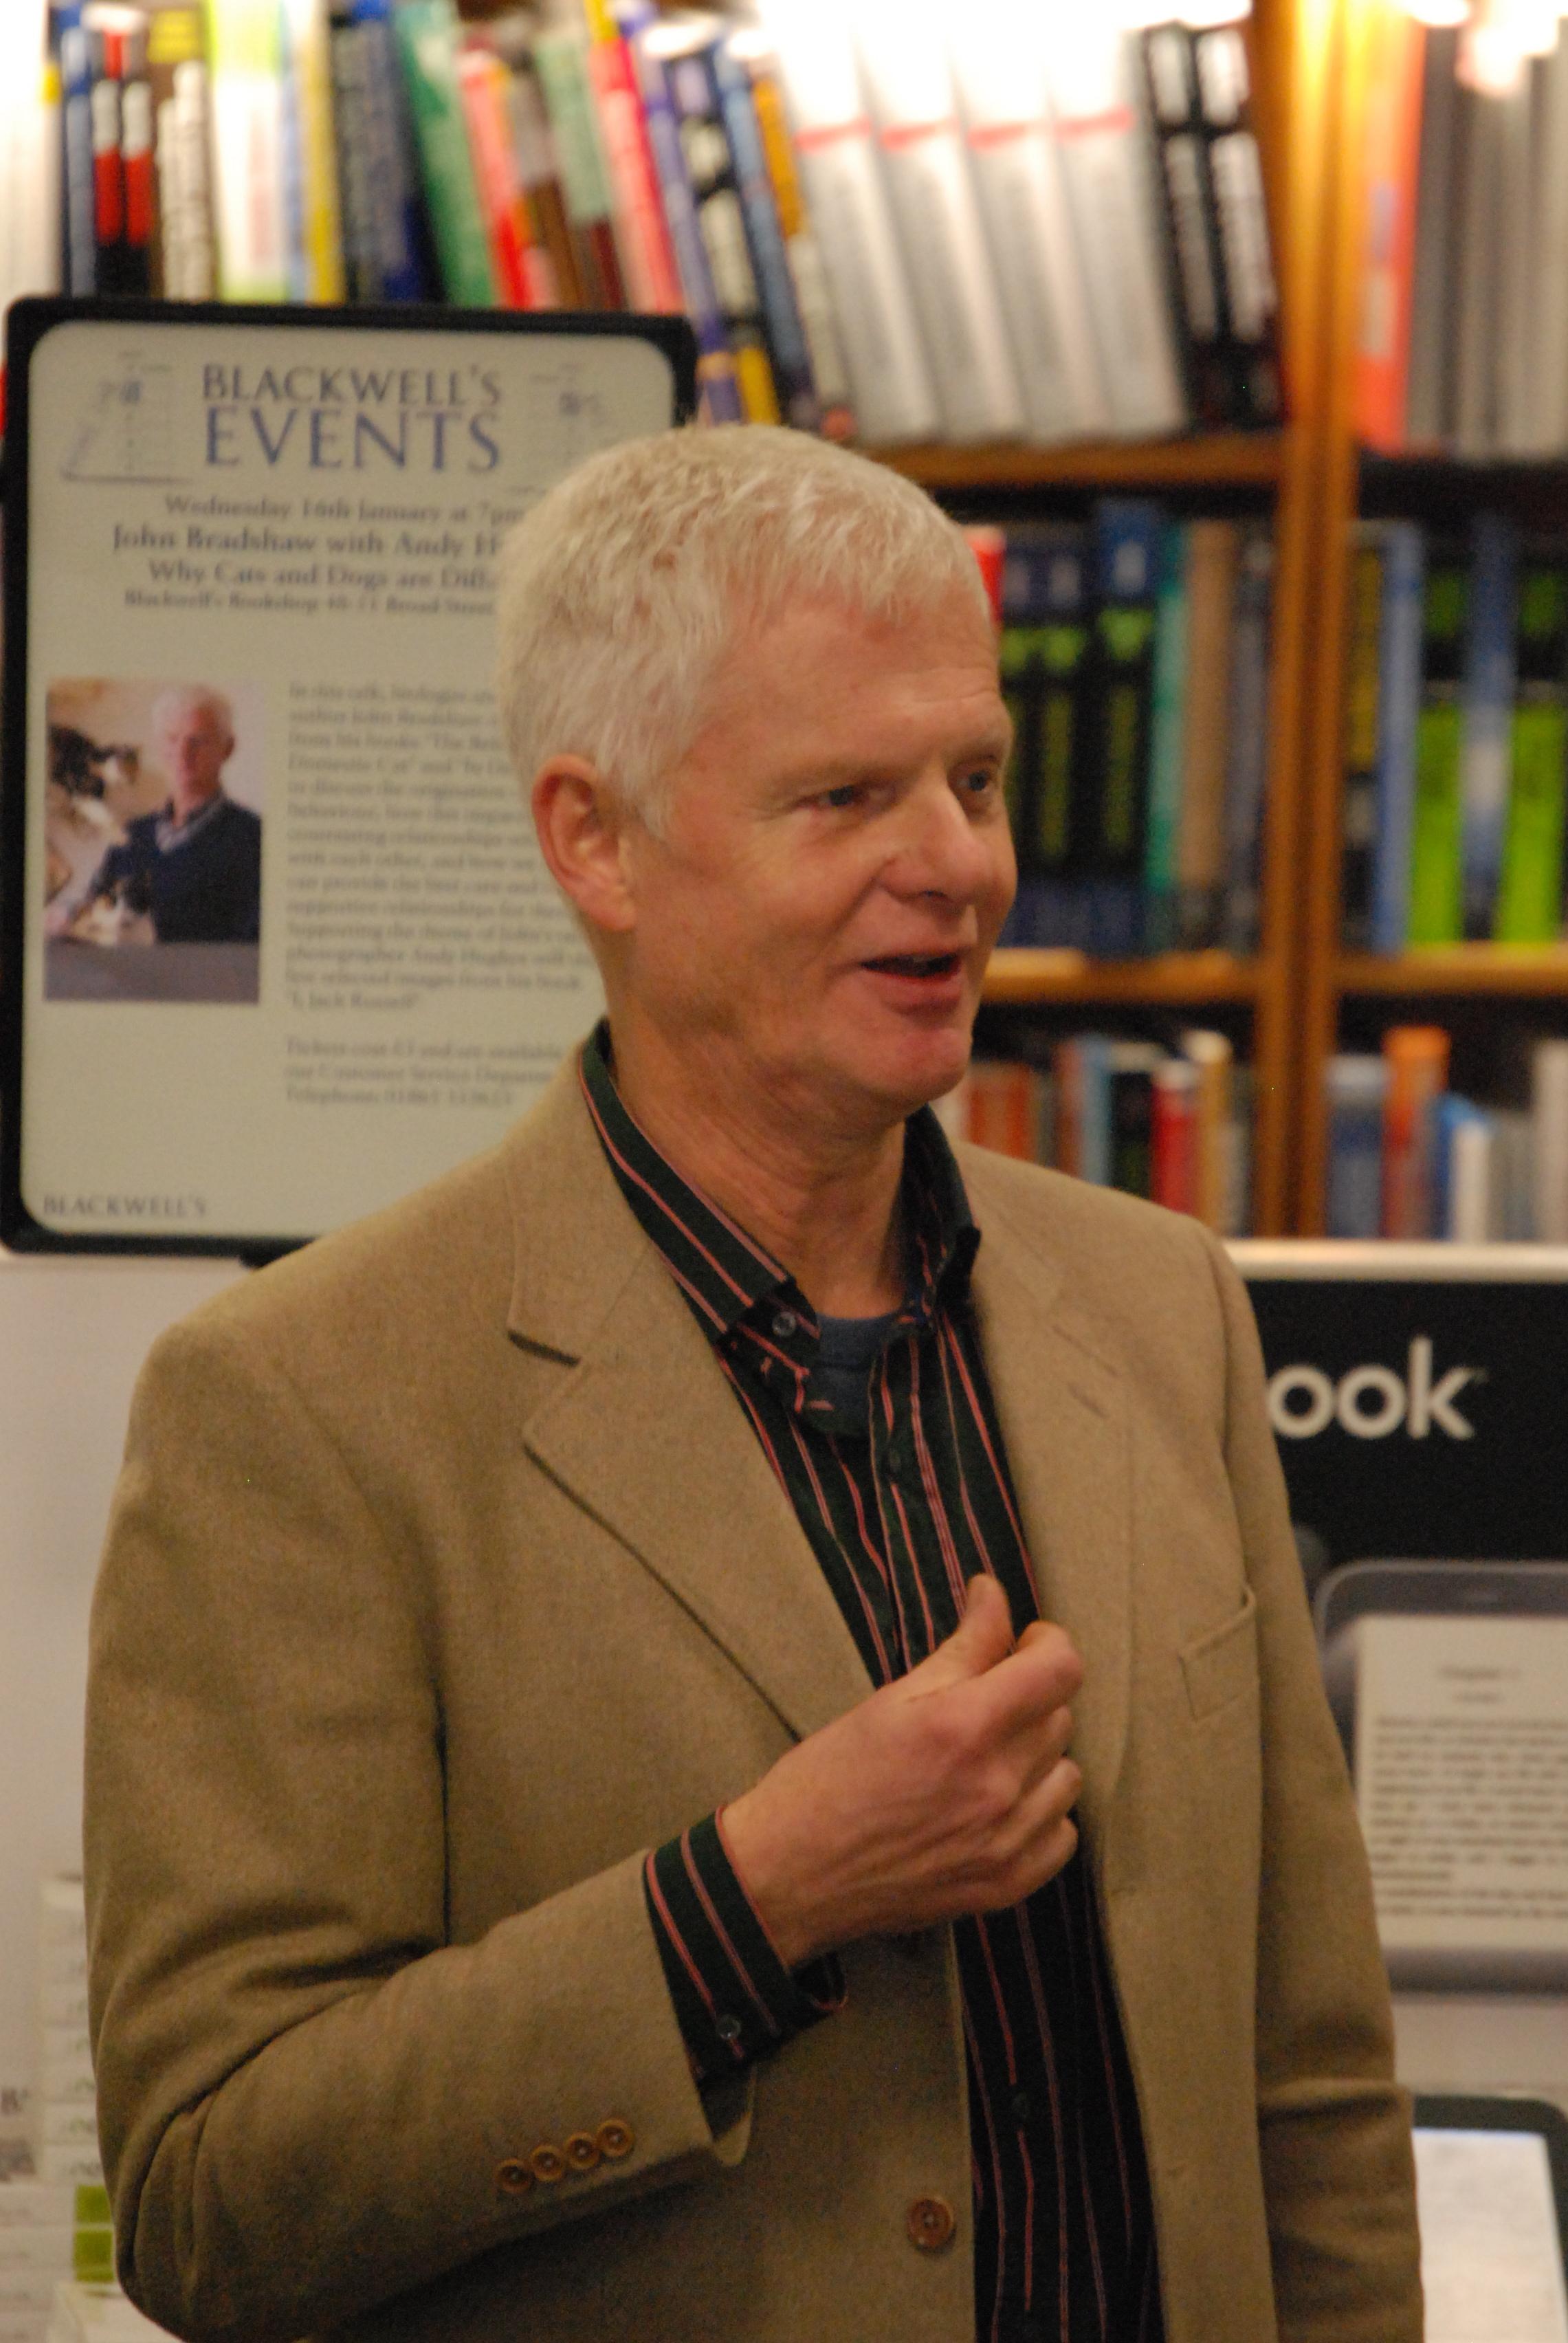 John Bradshaw